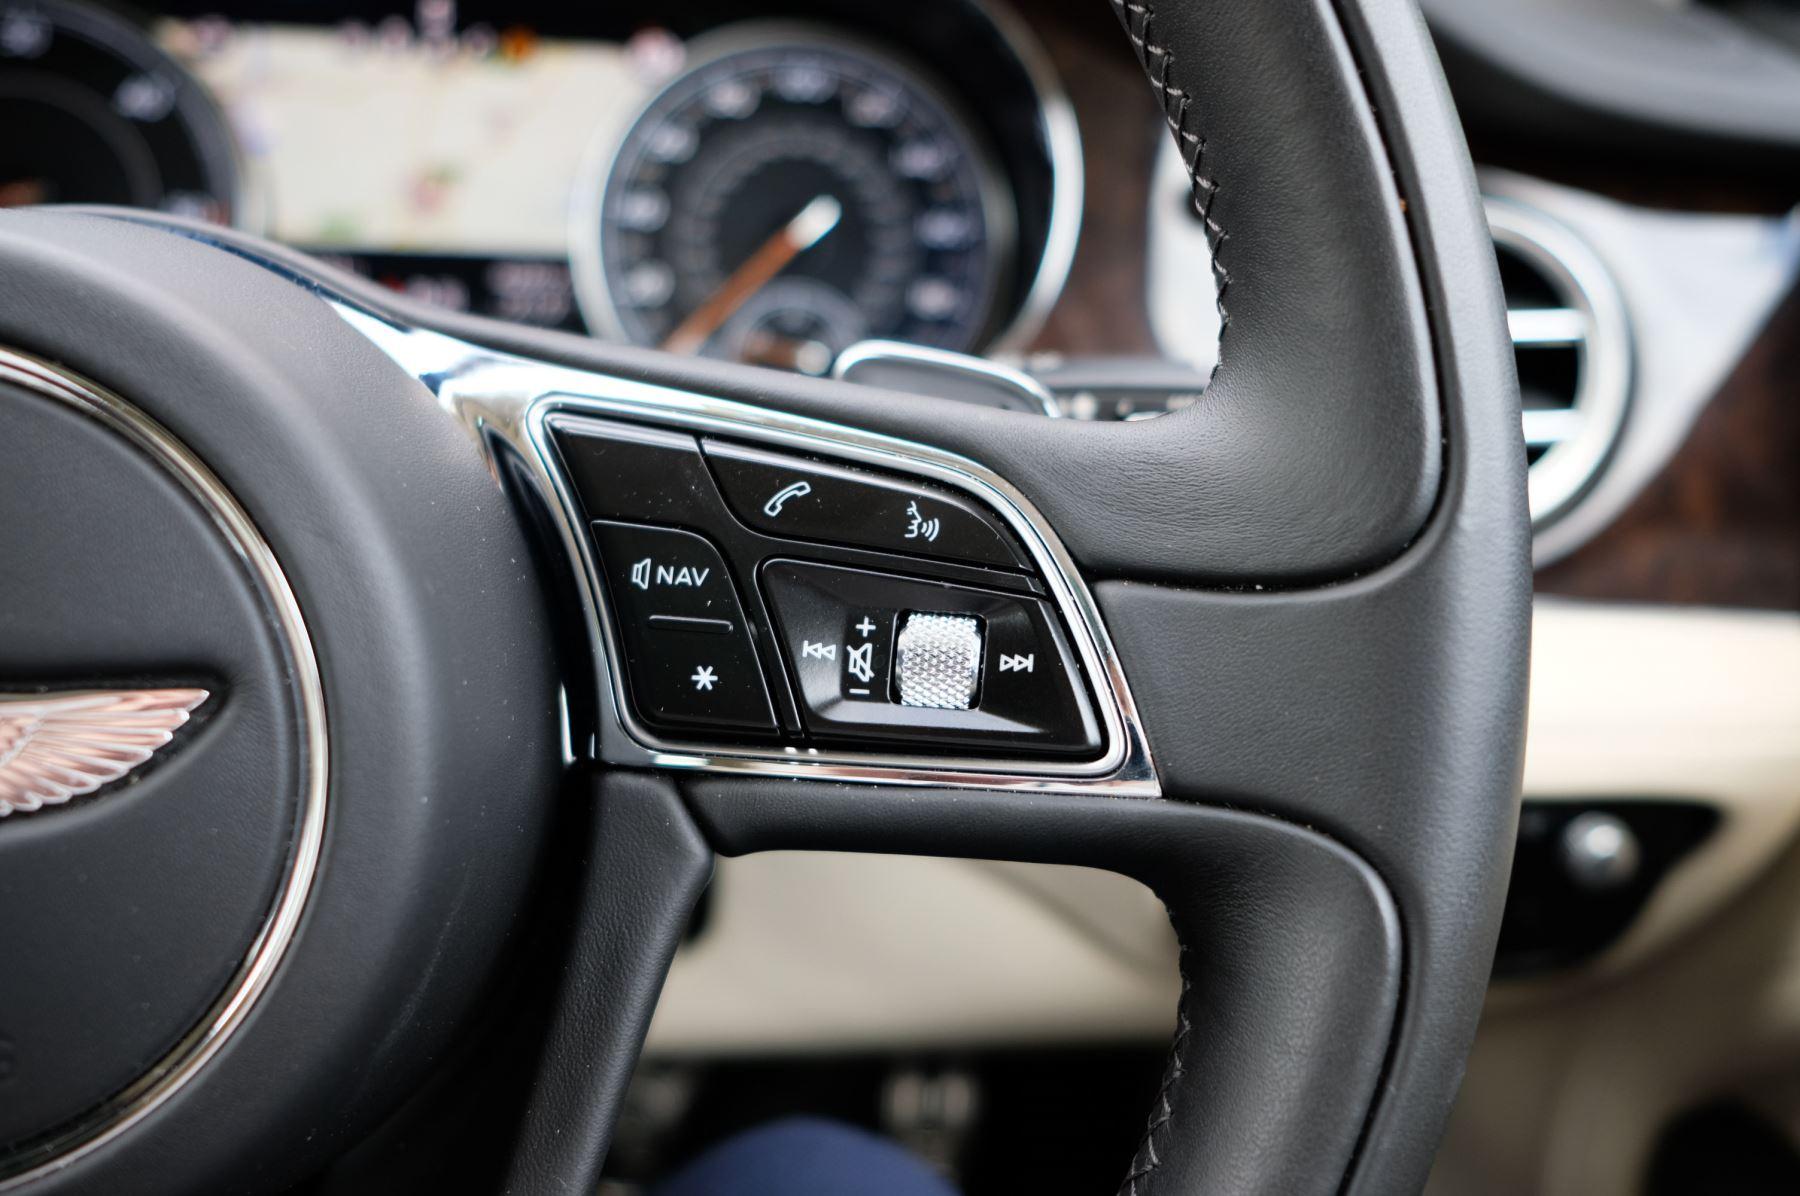 Bentley Bentayga 4.0 V8 5dr - Mulliner Driving Specification - City & Tour Specification image 26